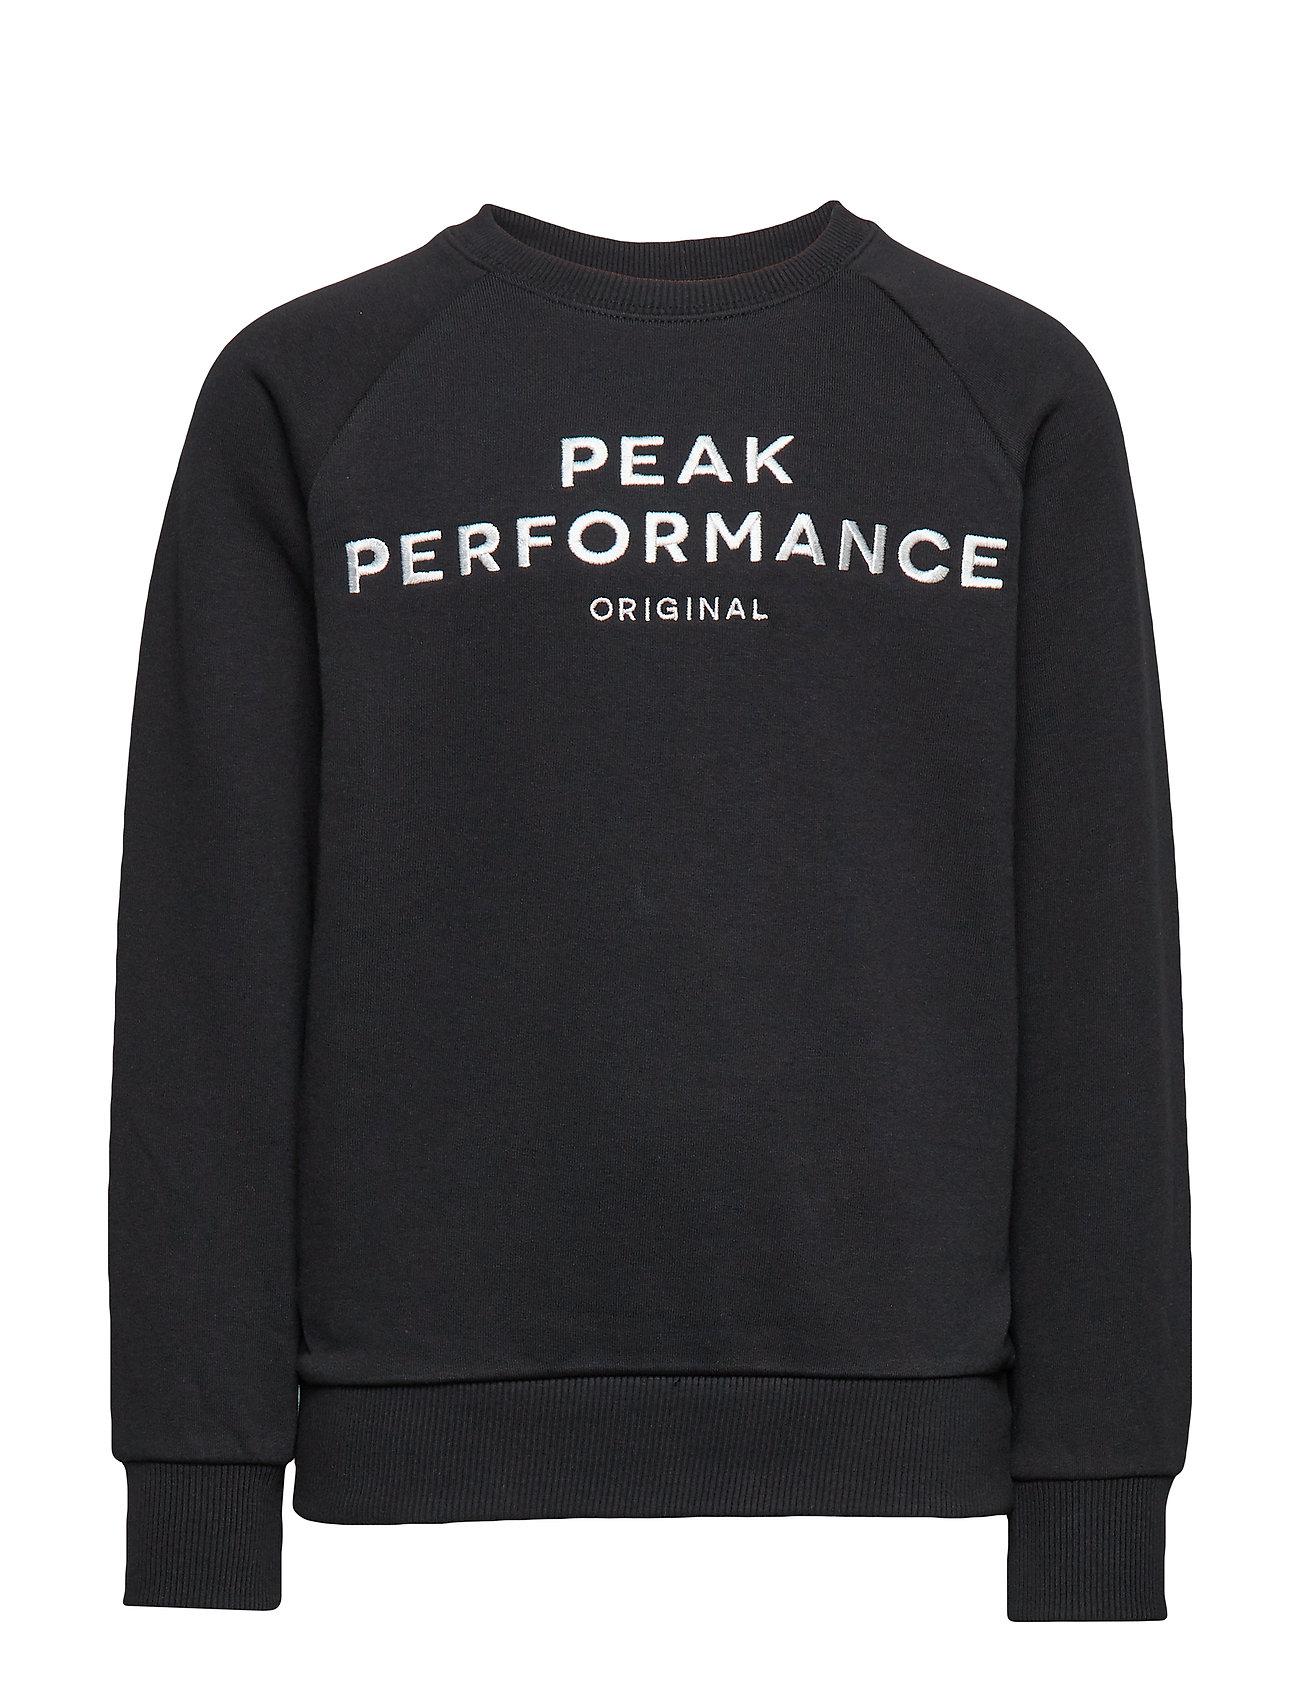 Peak Performance JR ORIGC - BLACK